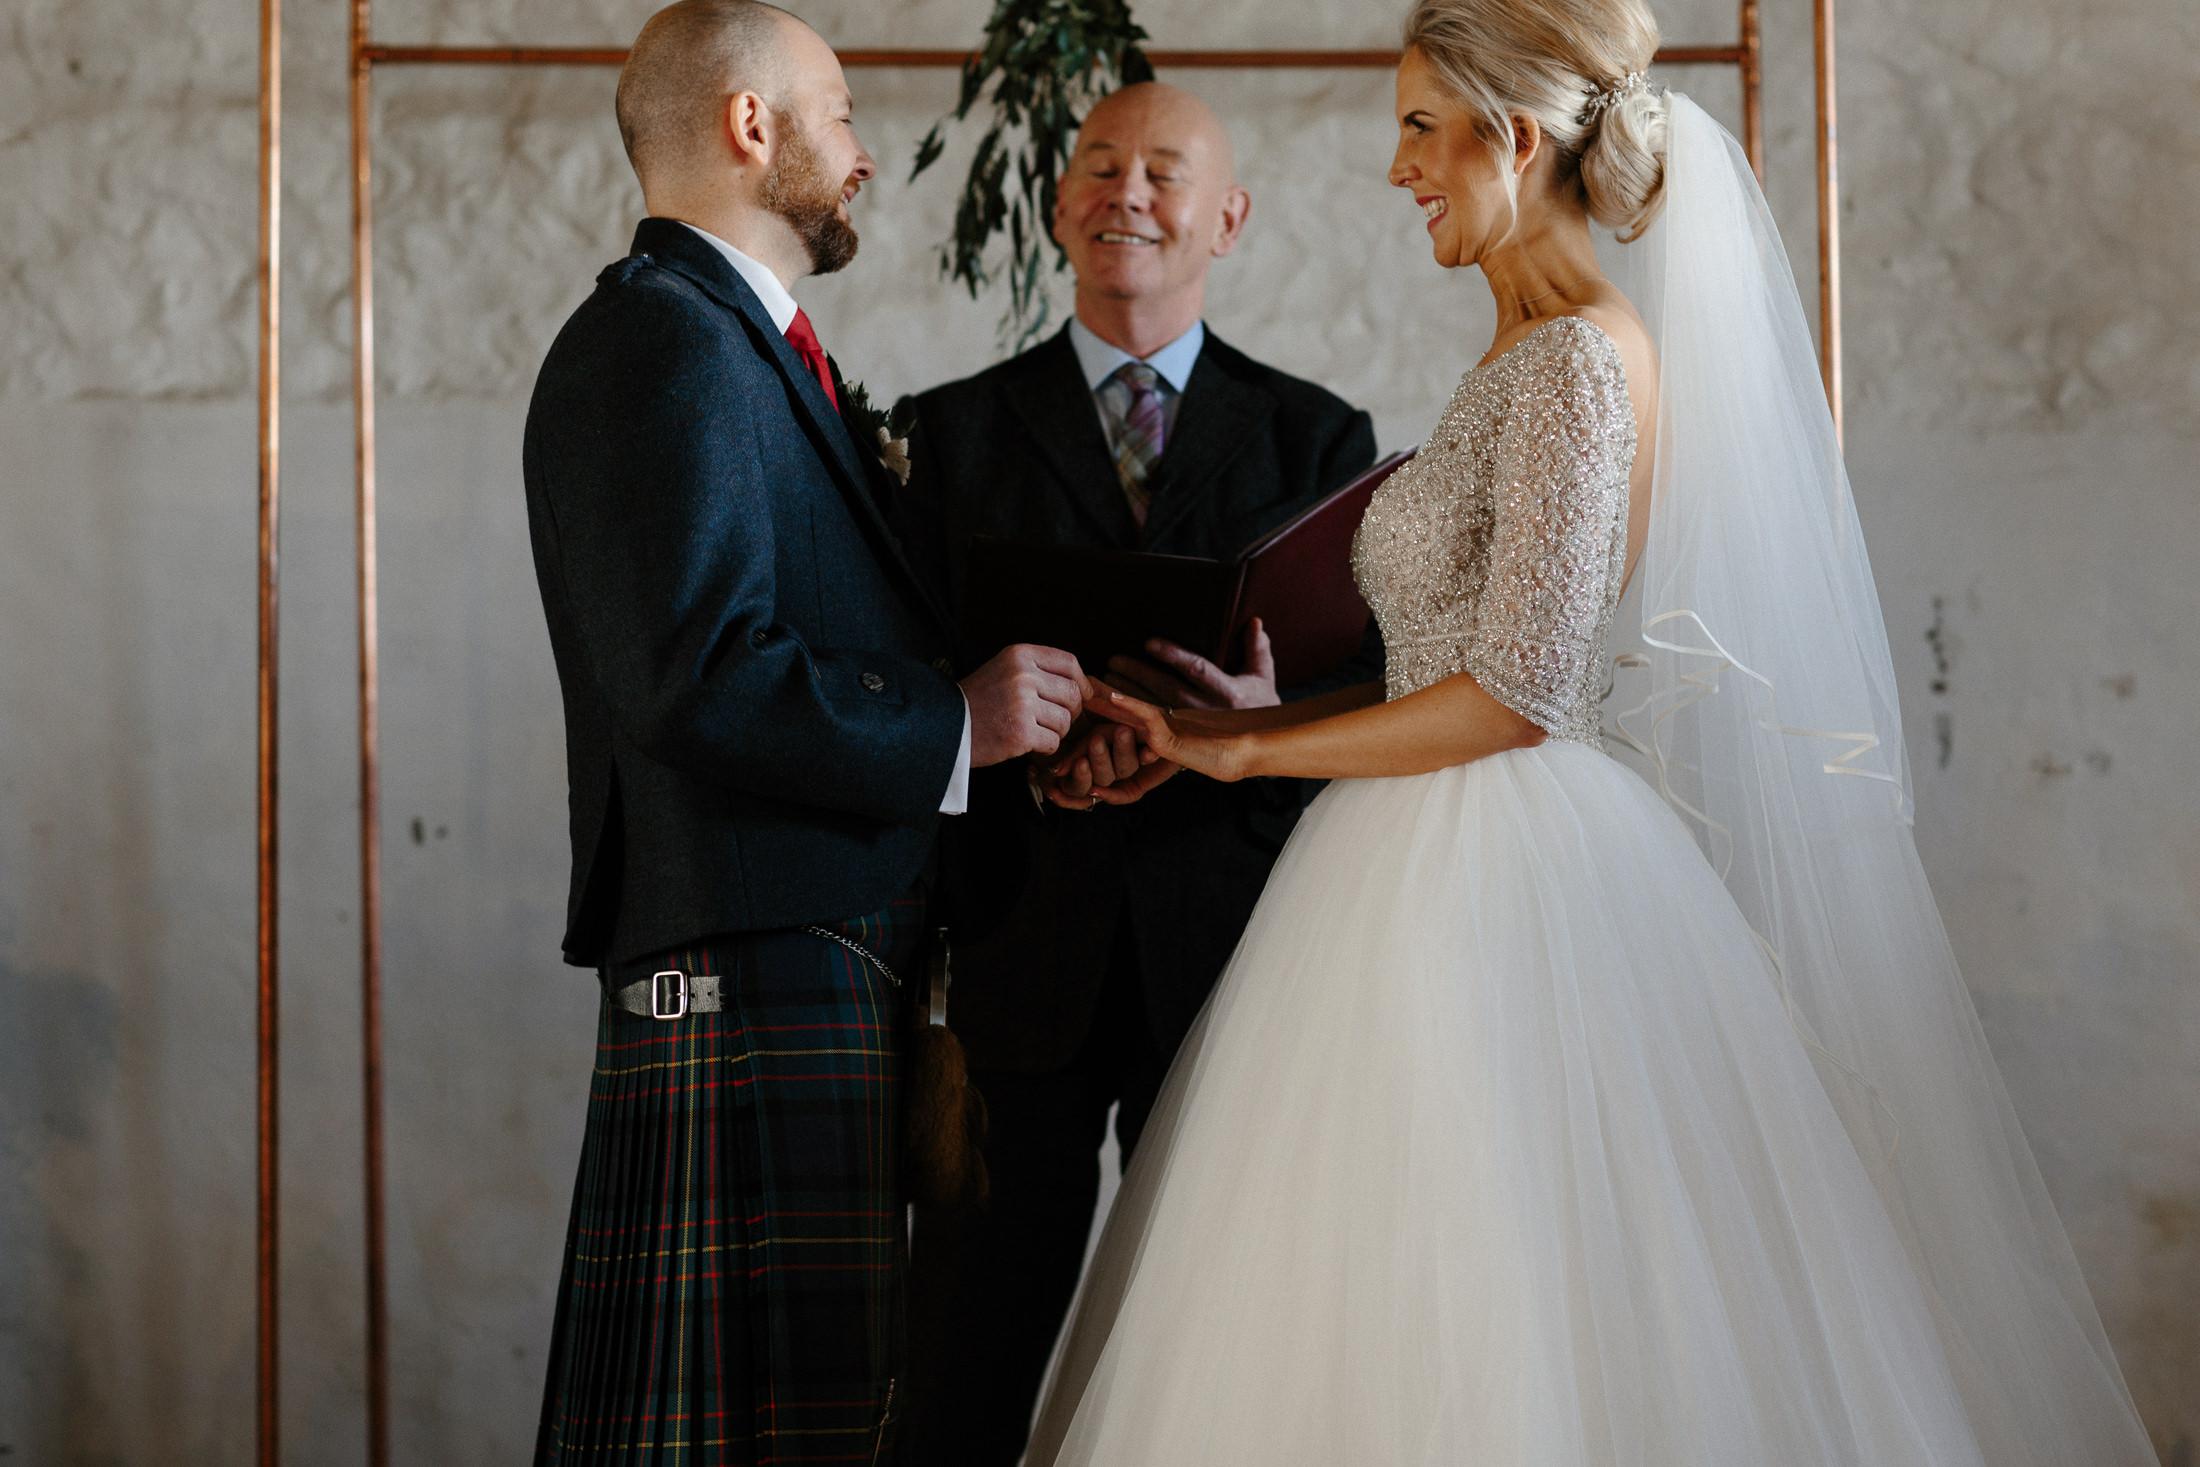 Kayleigh-Michael-Cow-Shed-Cowshed-Crail-Fife-Coastal-Rustic-Barn-Lianne-Mackay-Wedding-Photography-Photographer-Edinburgh-Glasgow-Scotland-WEB-RES-278.jpg